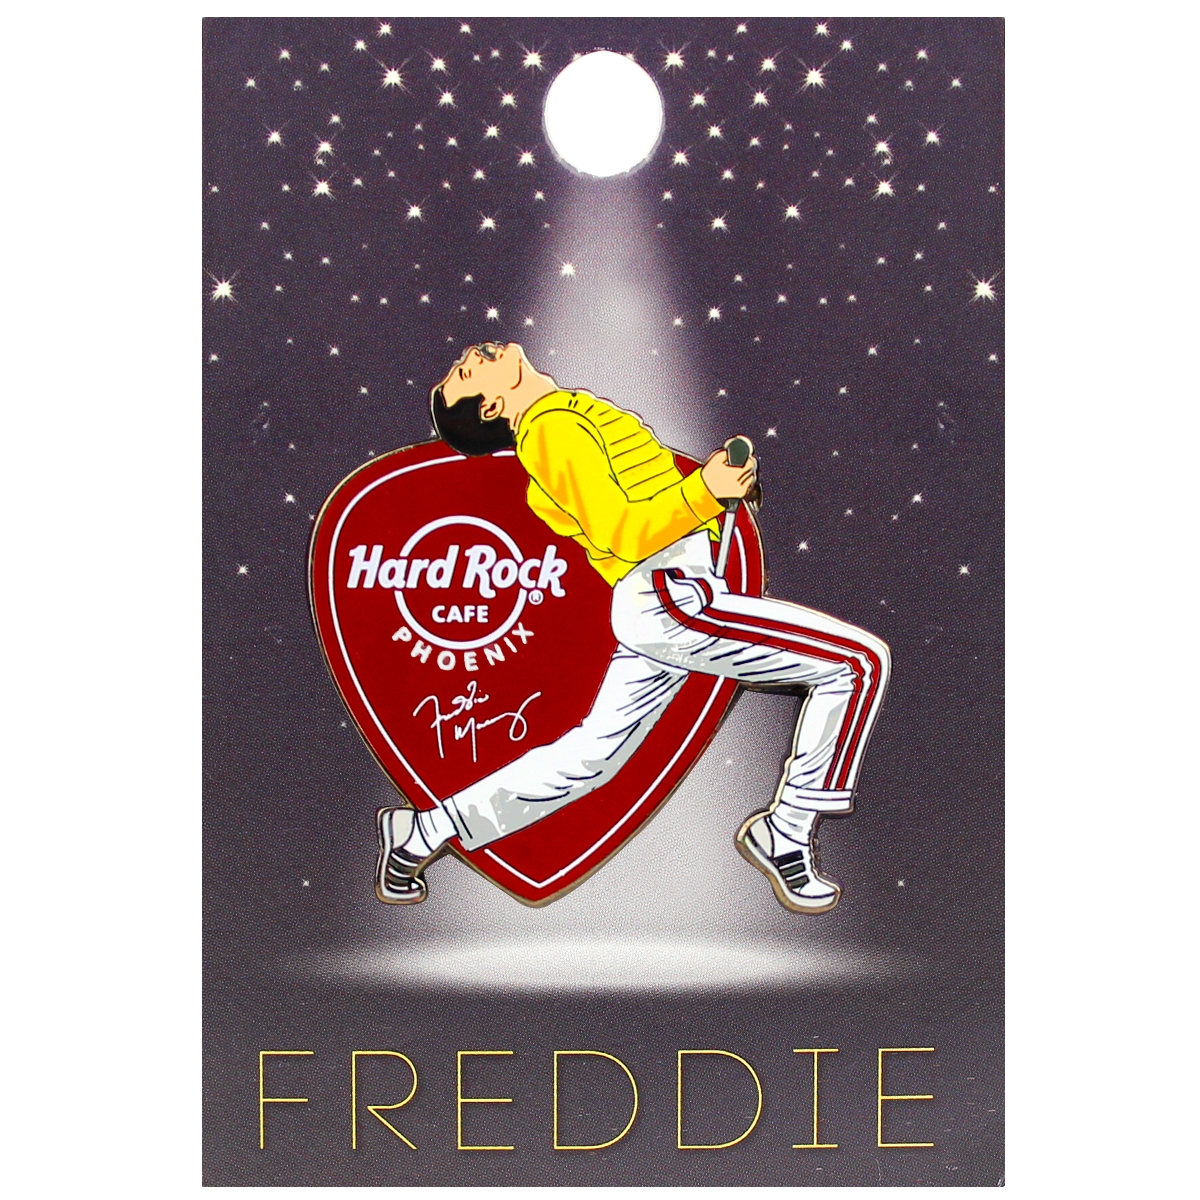 Freddie For A Day Pin 2018, Phoenix 0